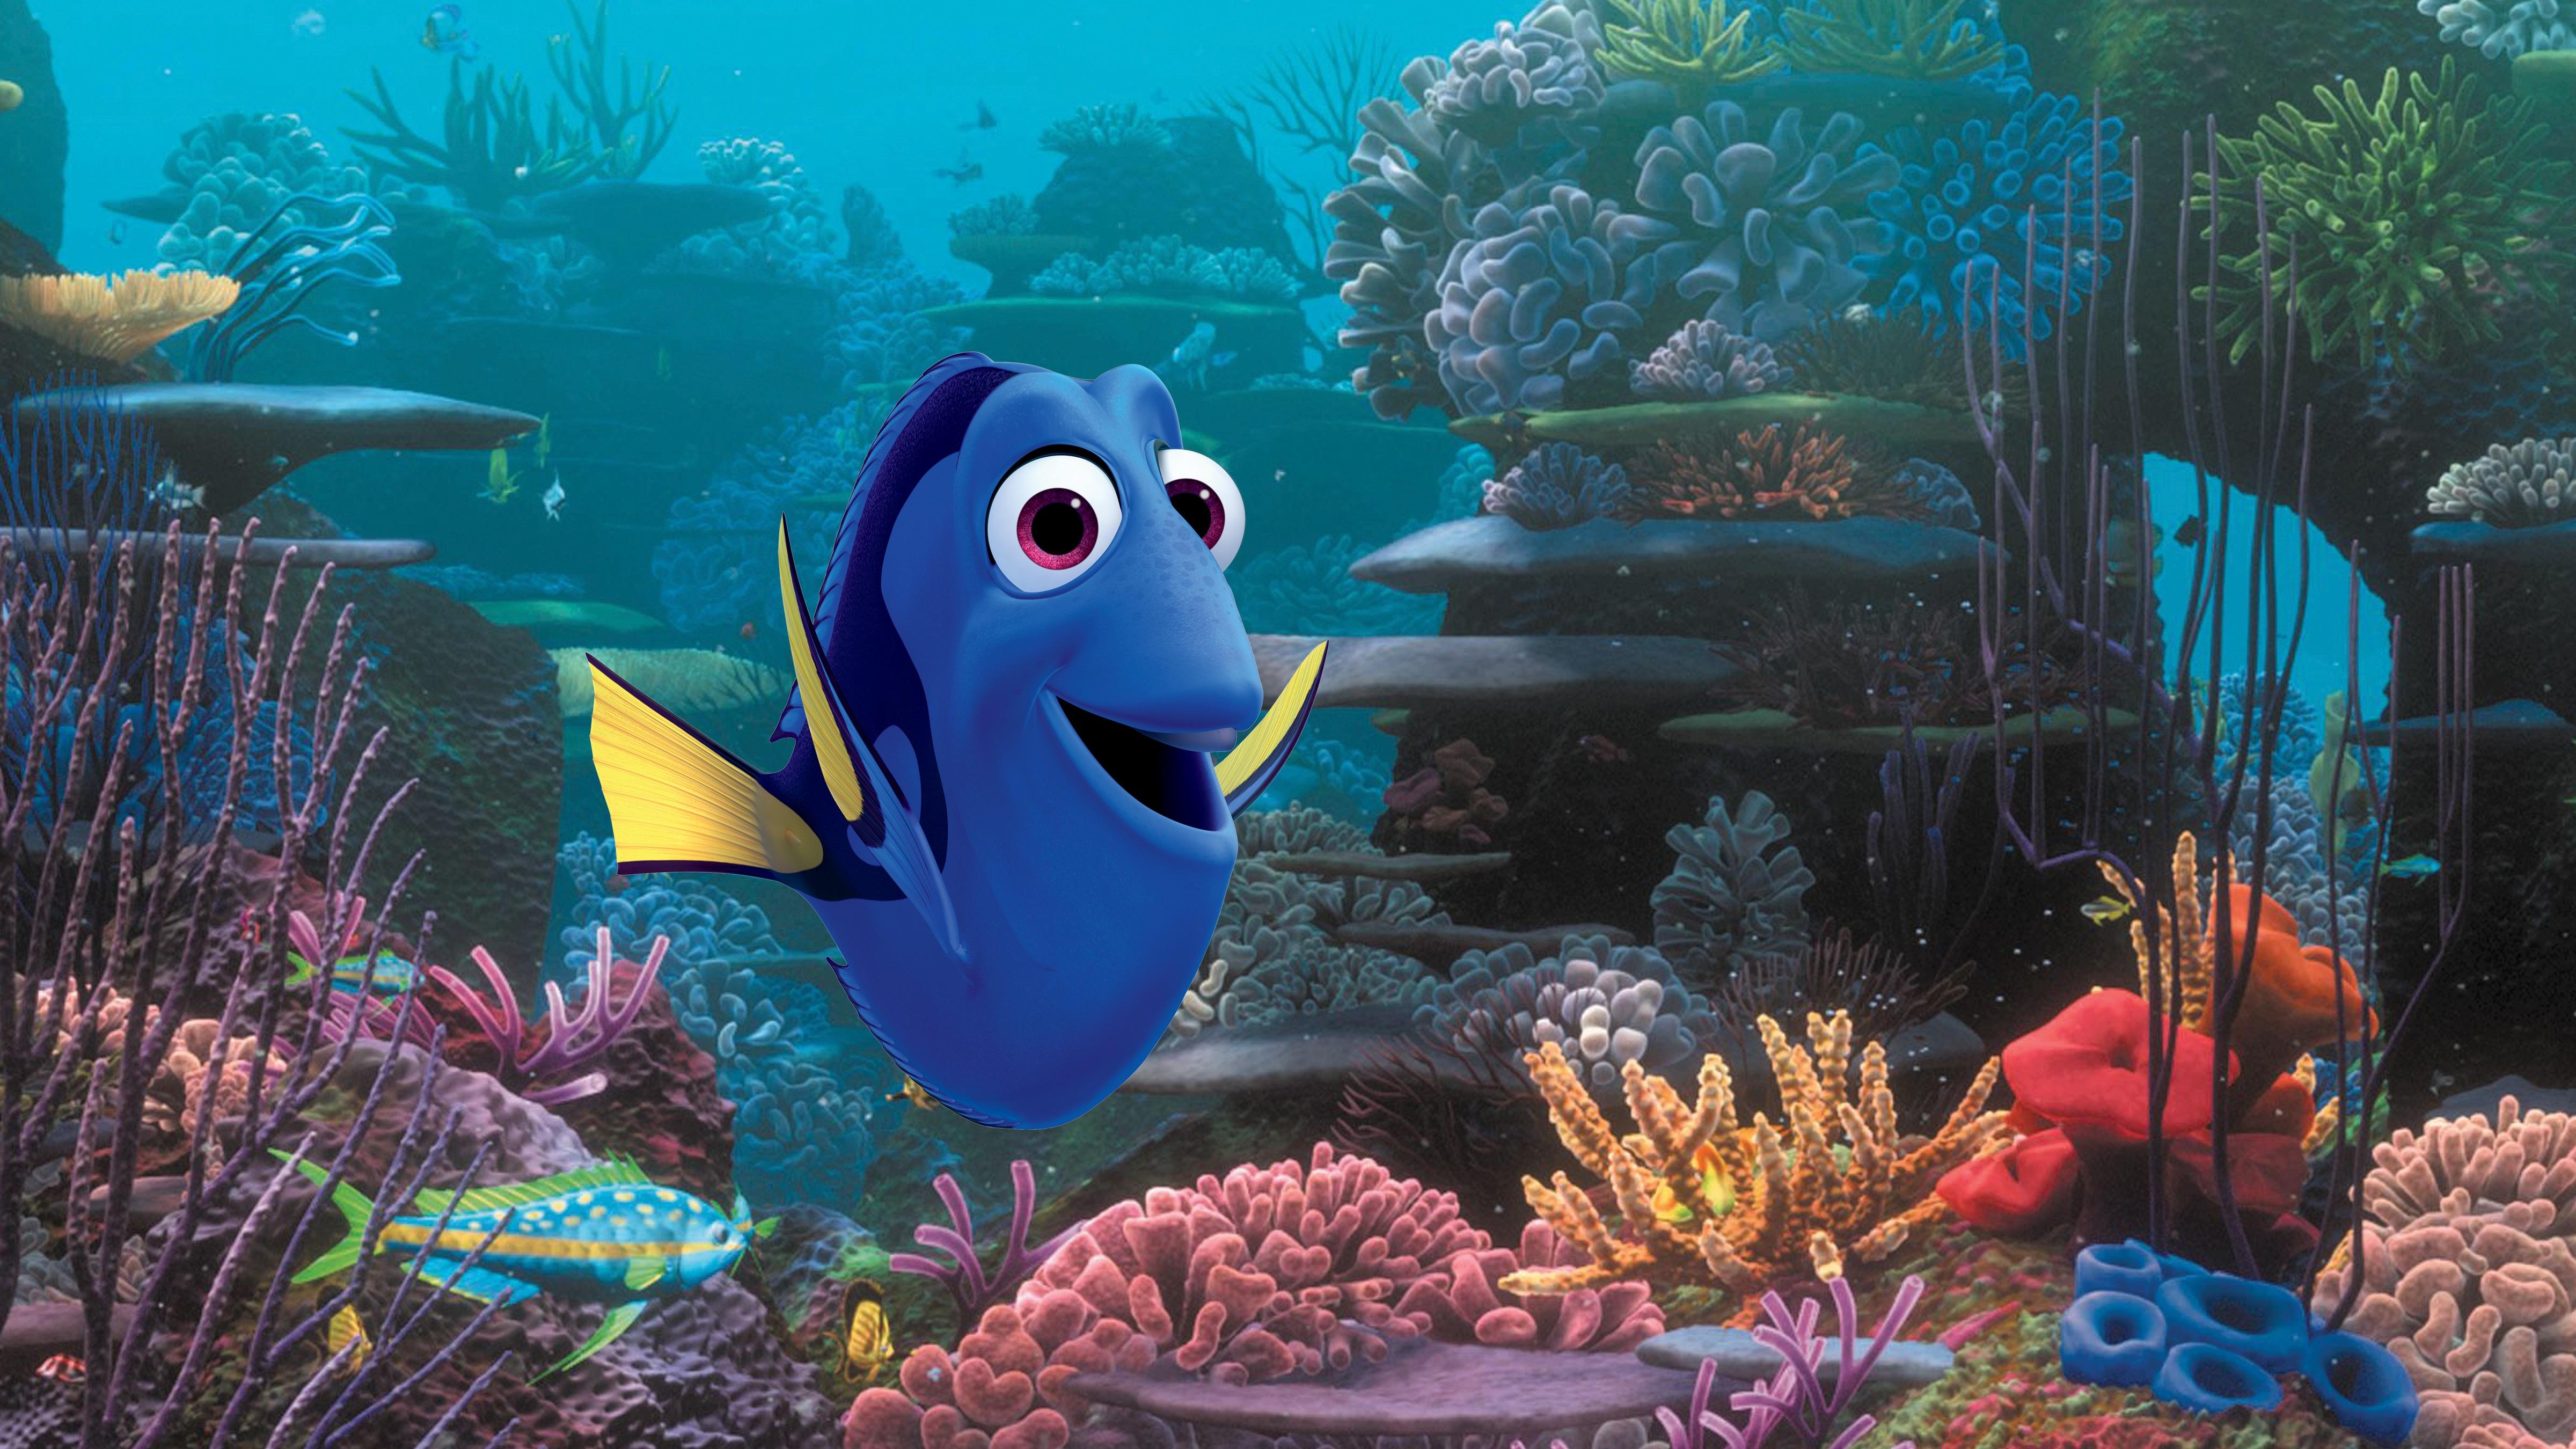 Pixar's 'Finding Dory' captures the 'Nemo' magic swimmingly